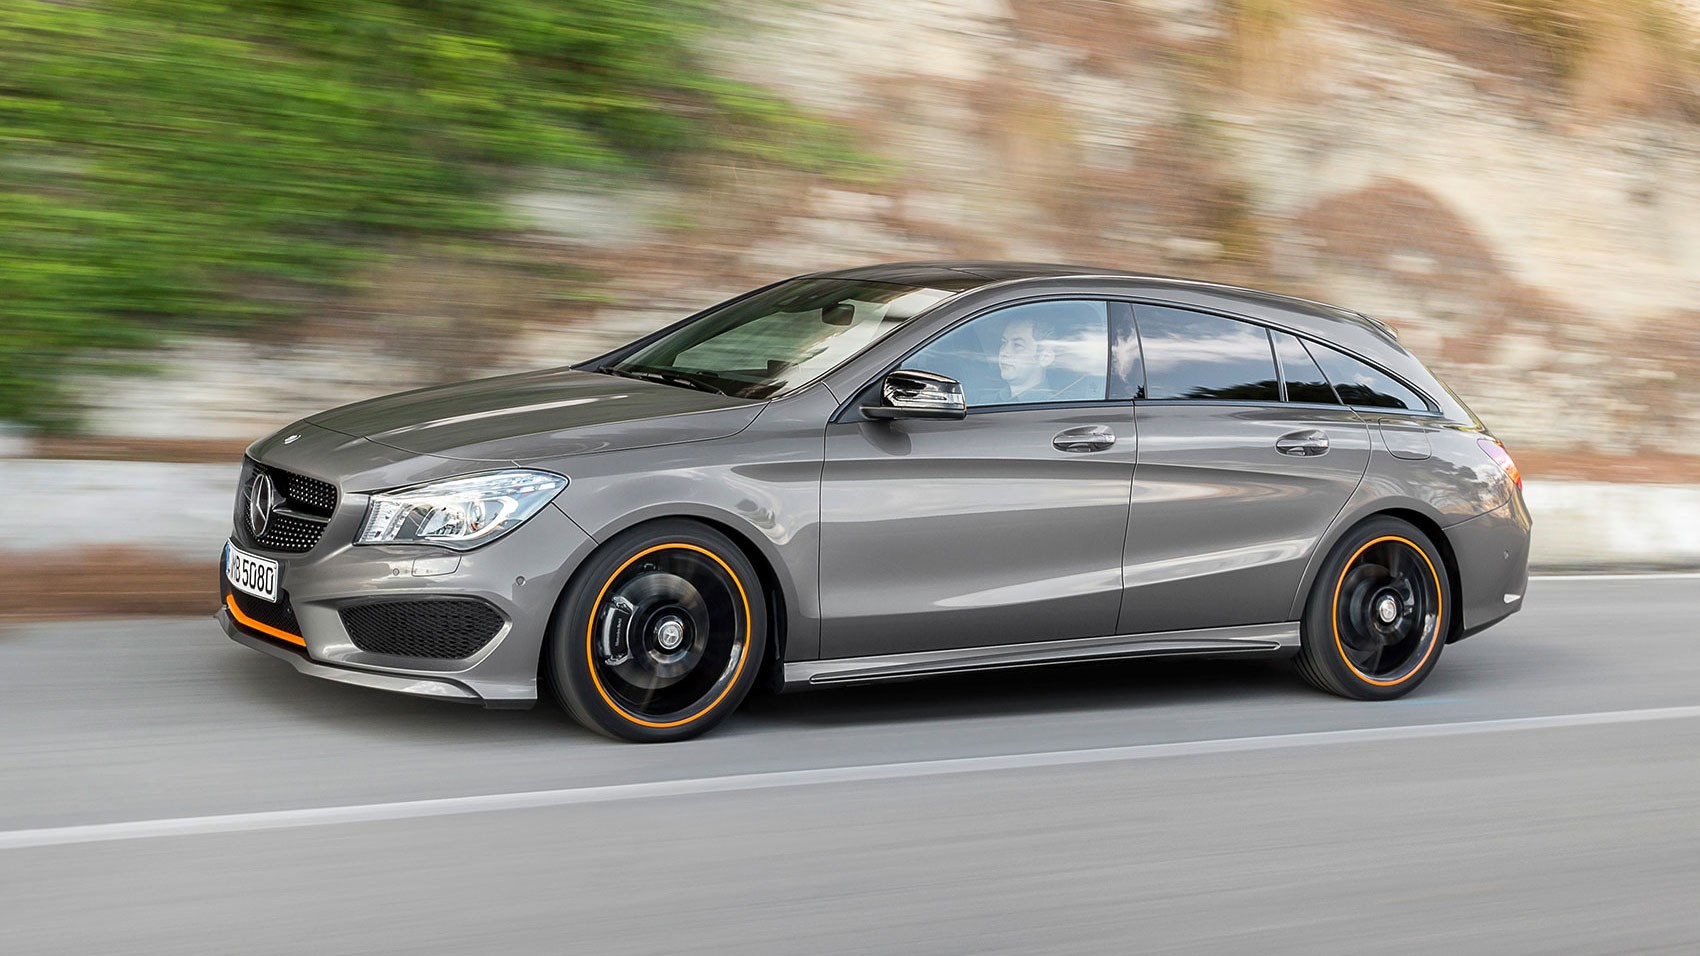 Mercedes Cla Shooting Brake 2015 Review Car Magazine